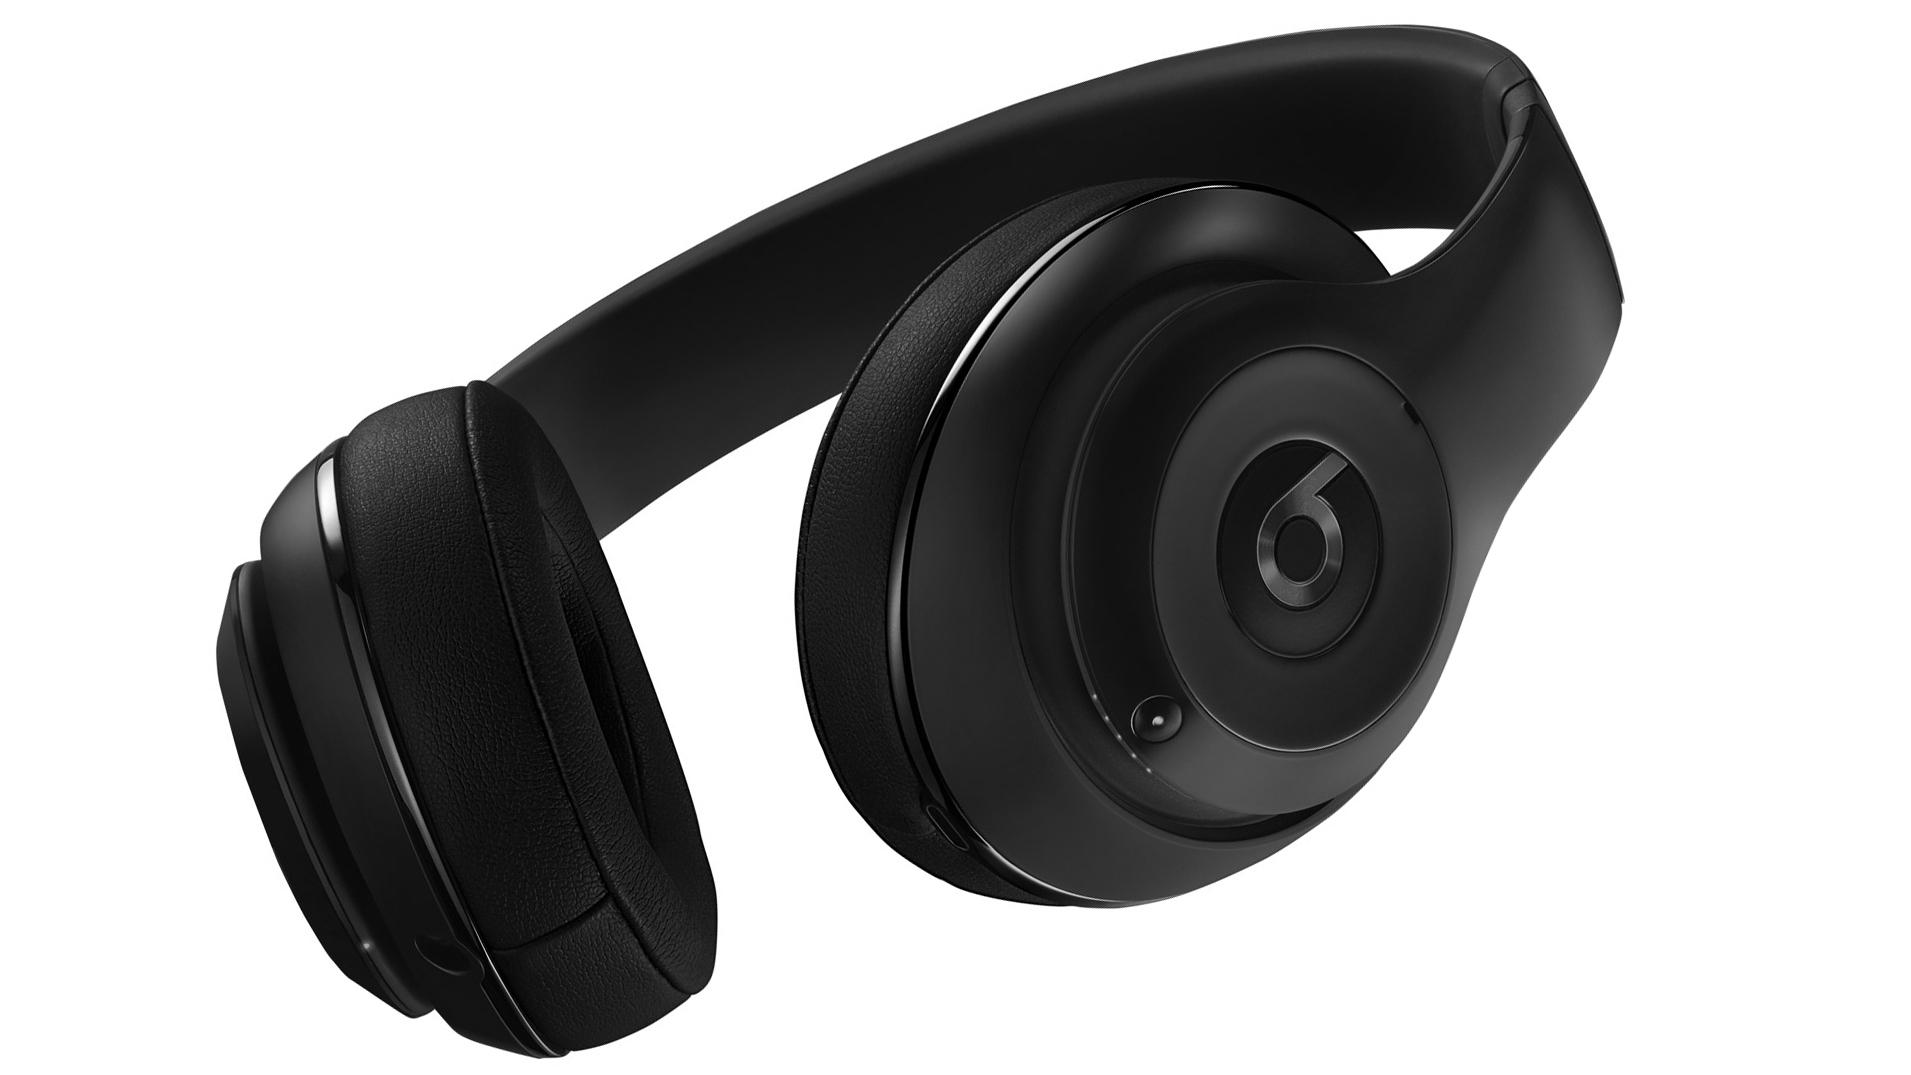 bluetooth headphones beats studio over ear 264 reg 300 more 9to5toys. Black Bedroom Furniture Sets. Home Design Ideas